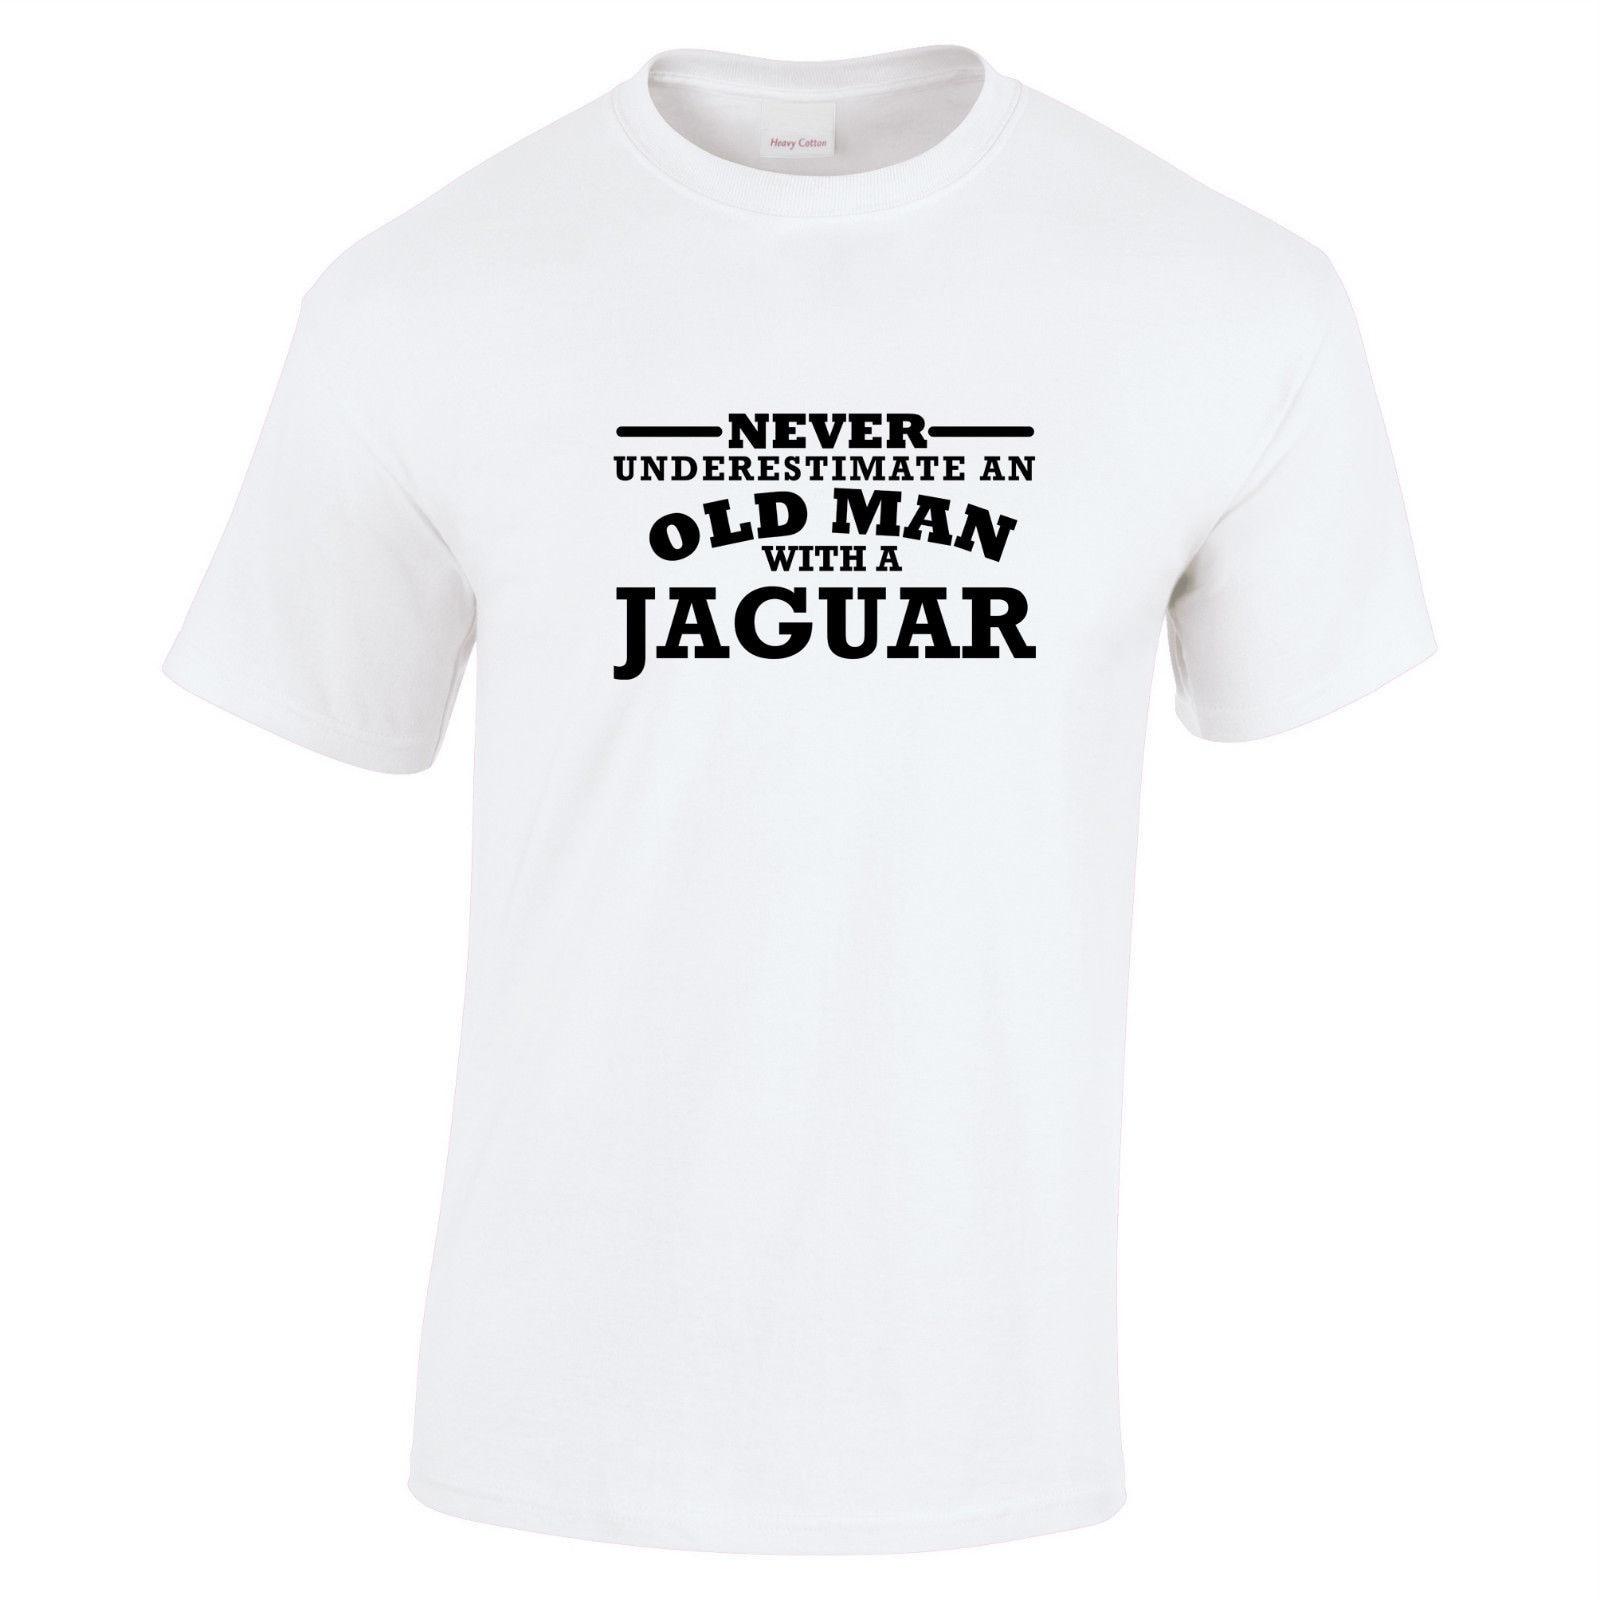 fendi cotton for men black clothing shirts blue lyst in t gallery navy jaguar tee